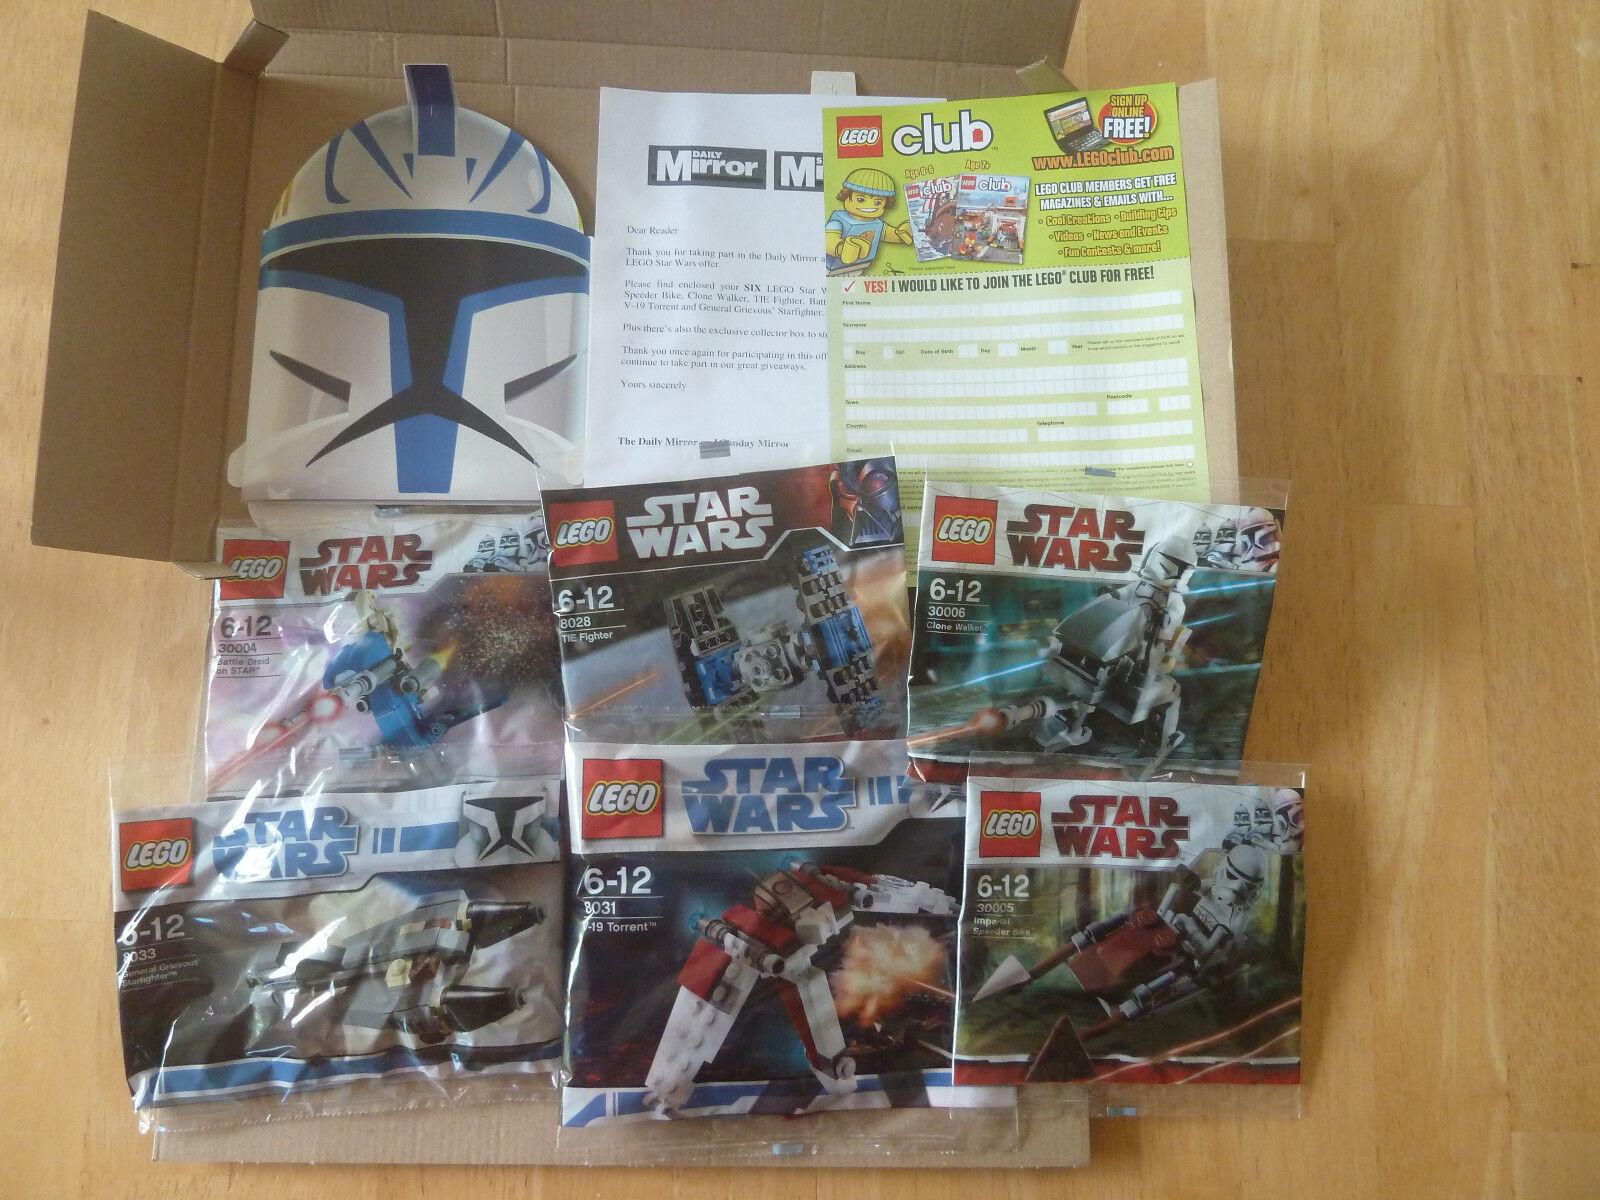 6 x Lego Set -  6 Star Wars Collector Series Plus Star Wars Gift Box - BNIB 9